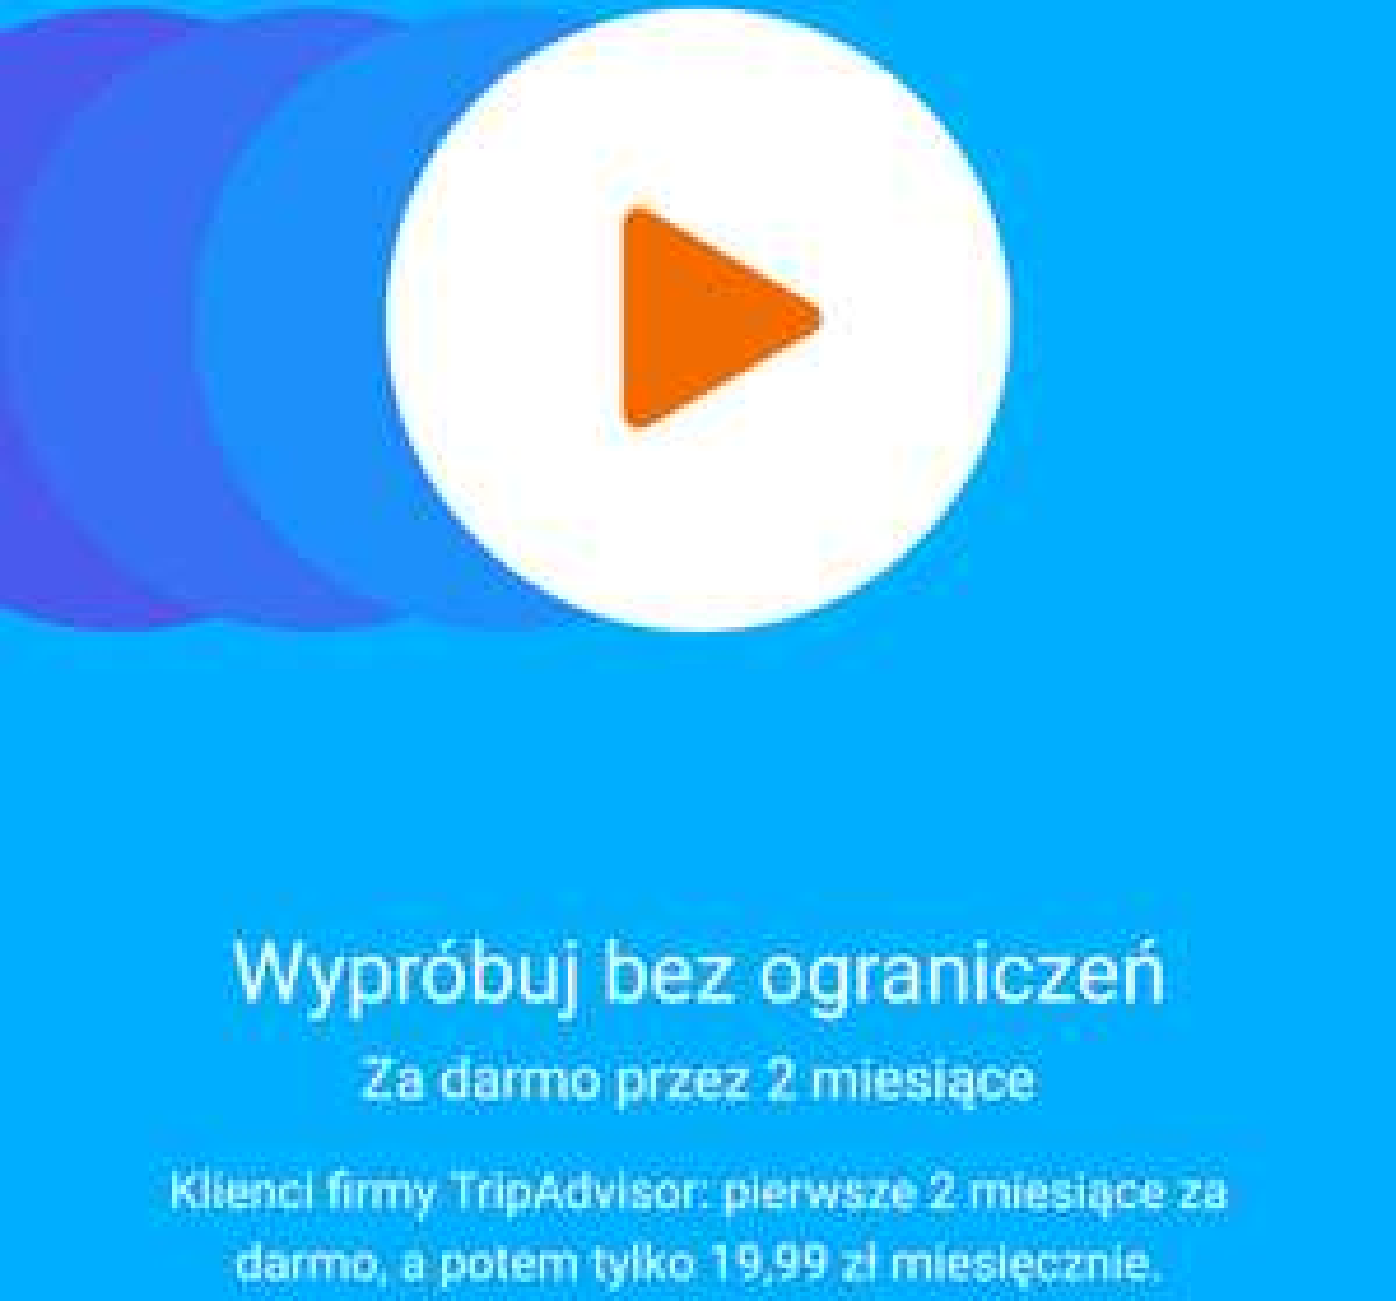 2 miesiące subskrypcji Google Play Music za darmo od TripAdivsor